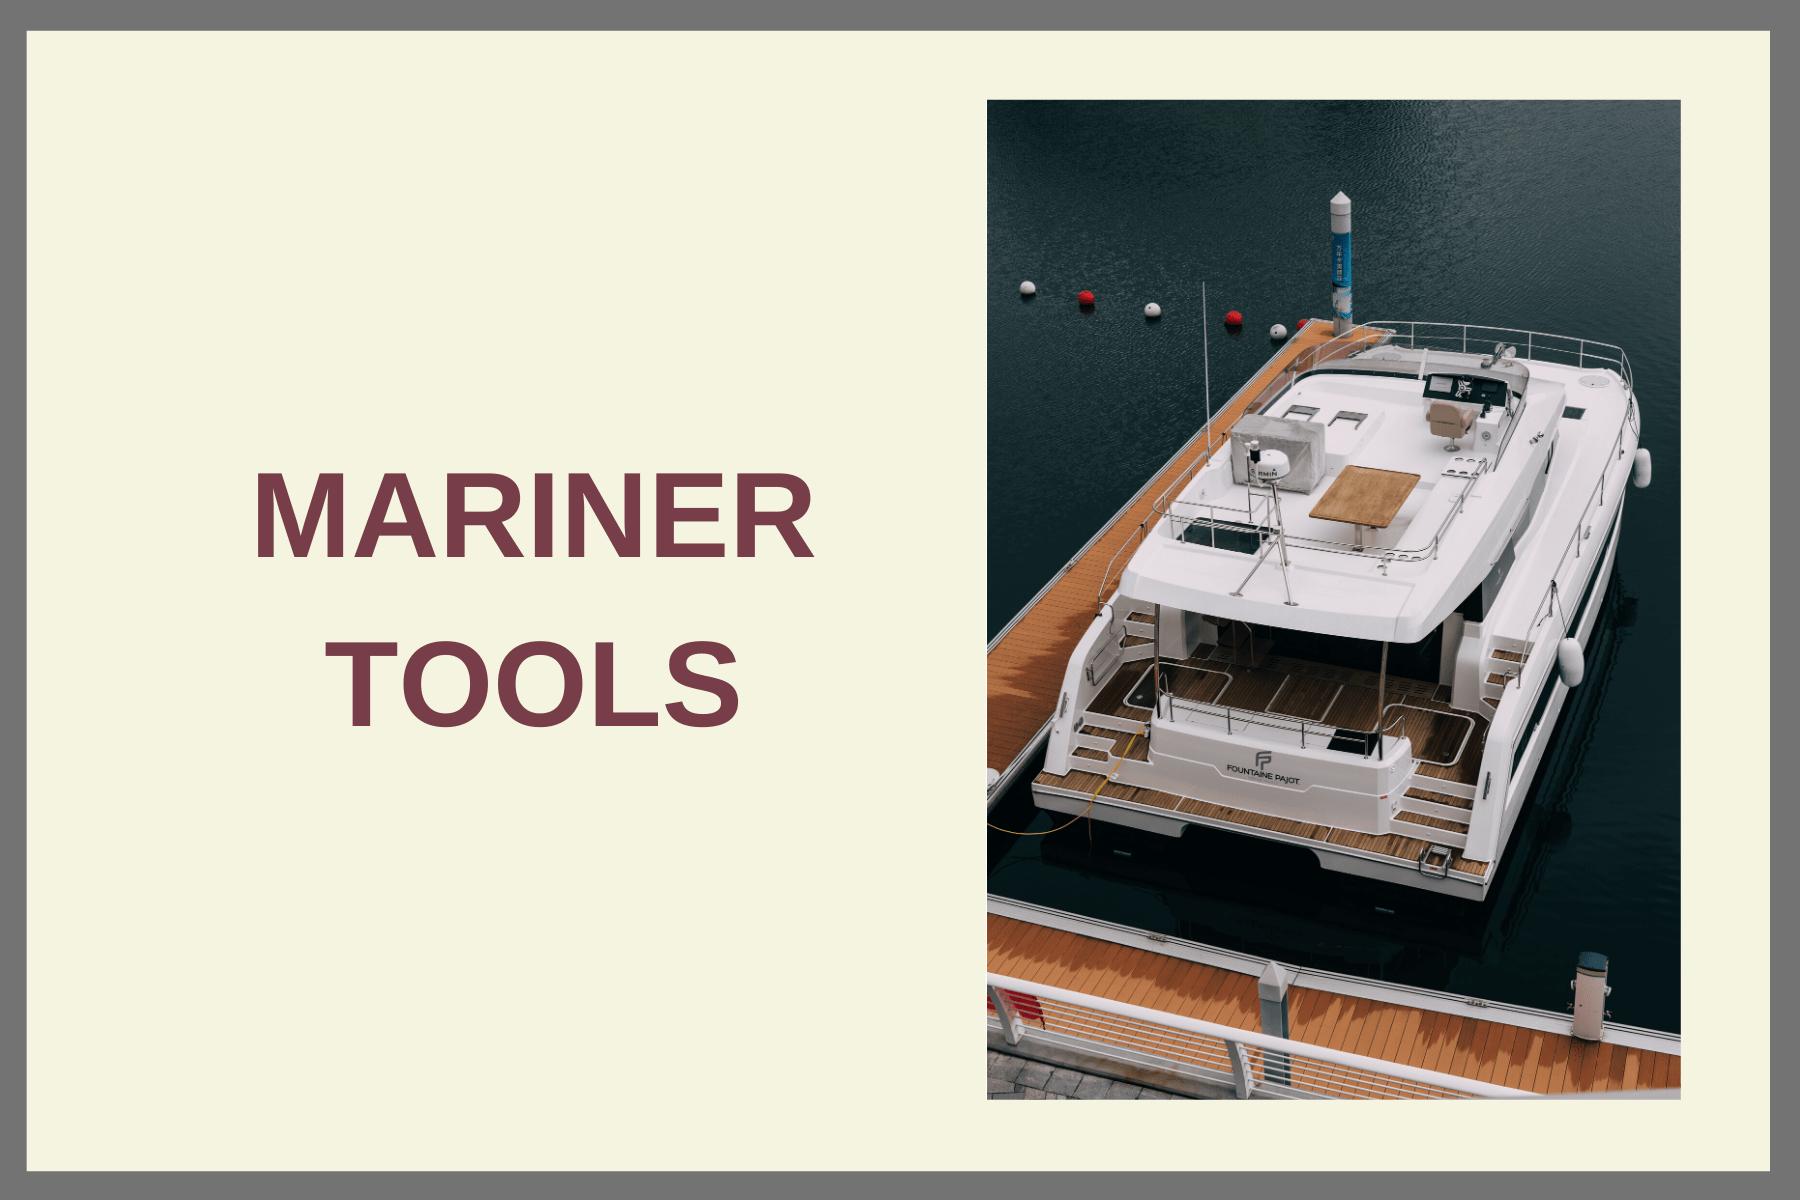 marine tools brushes brush epoxy roller varnish block paint painting painter